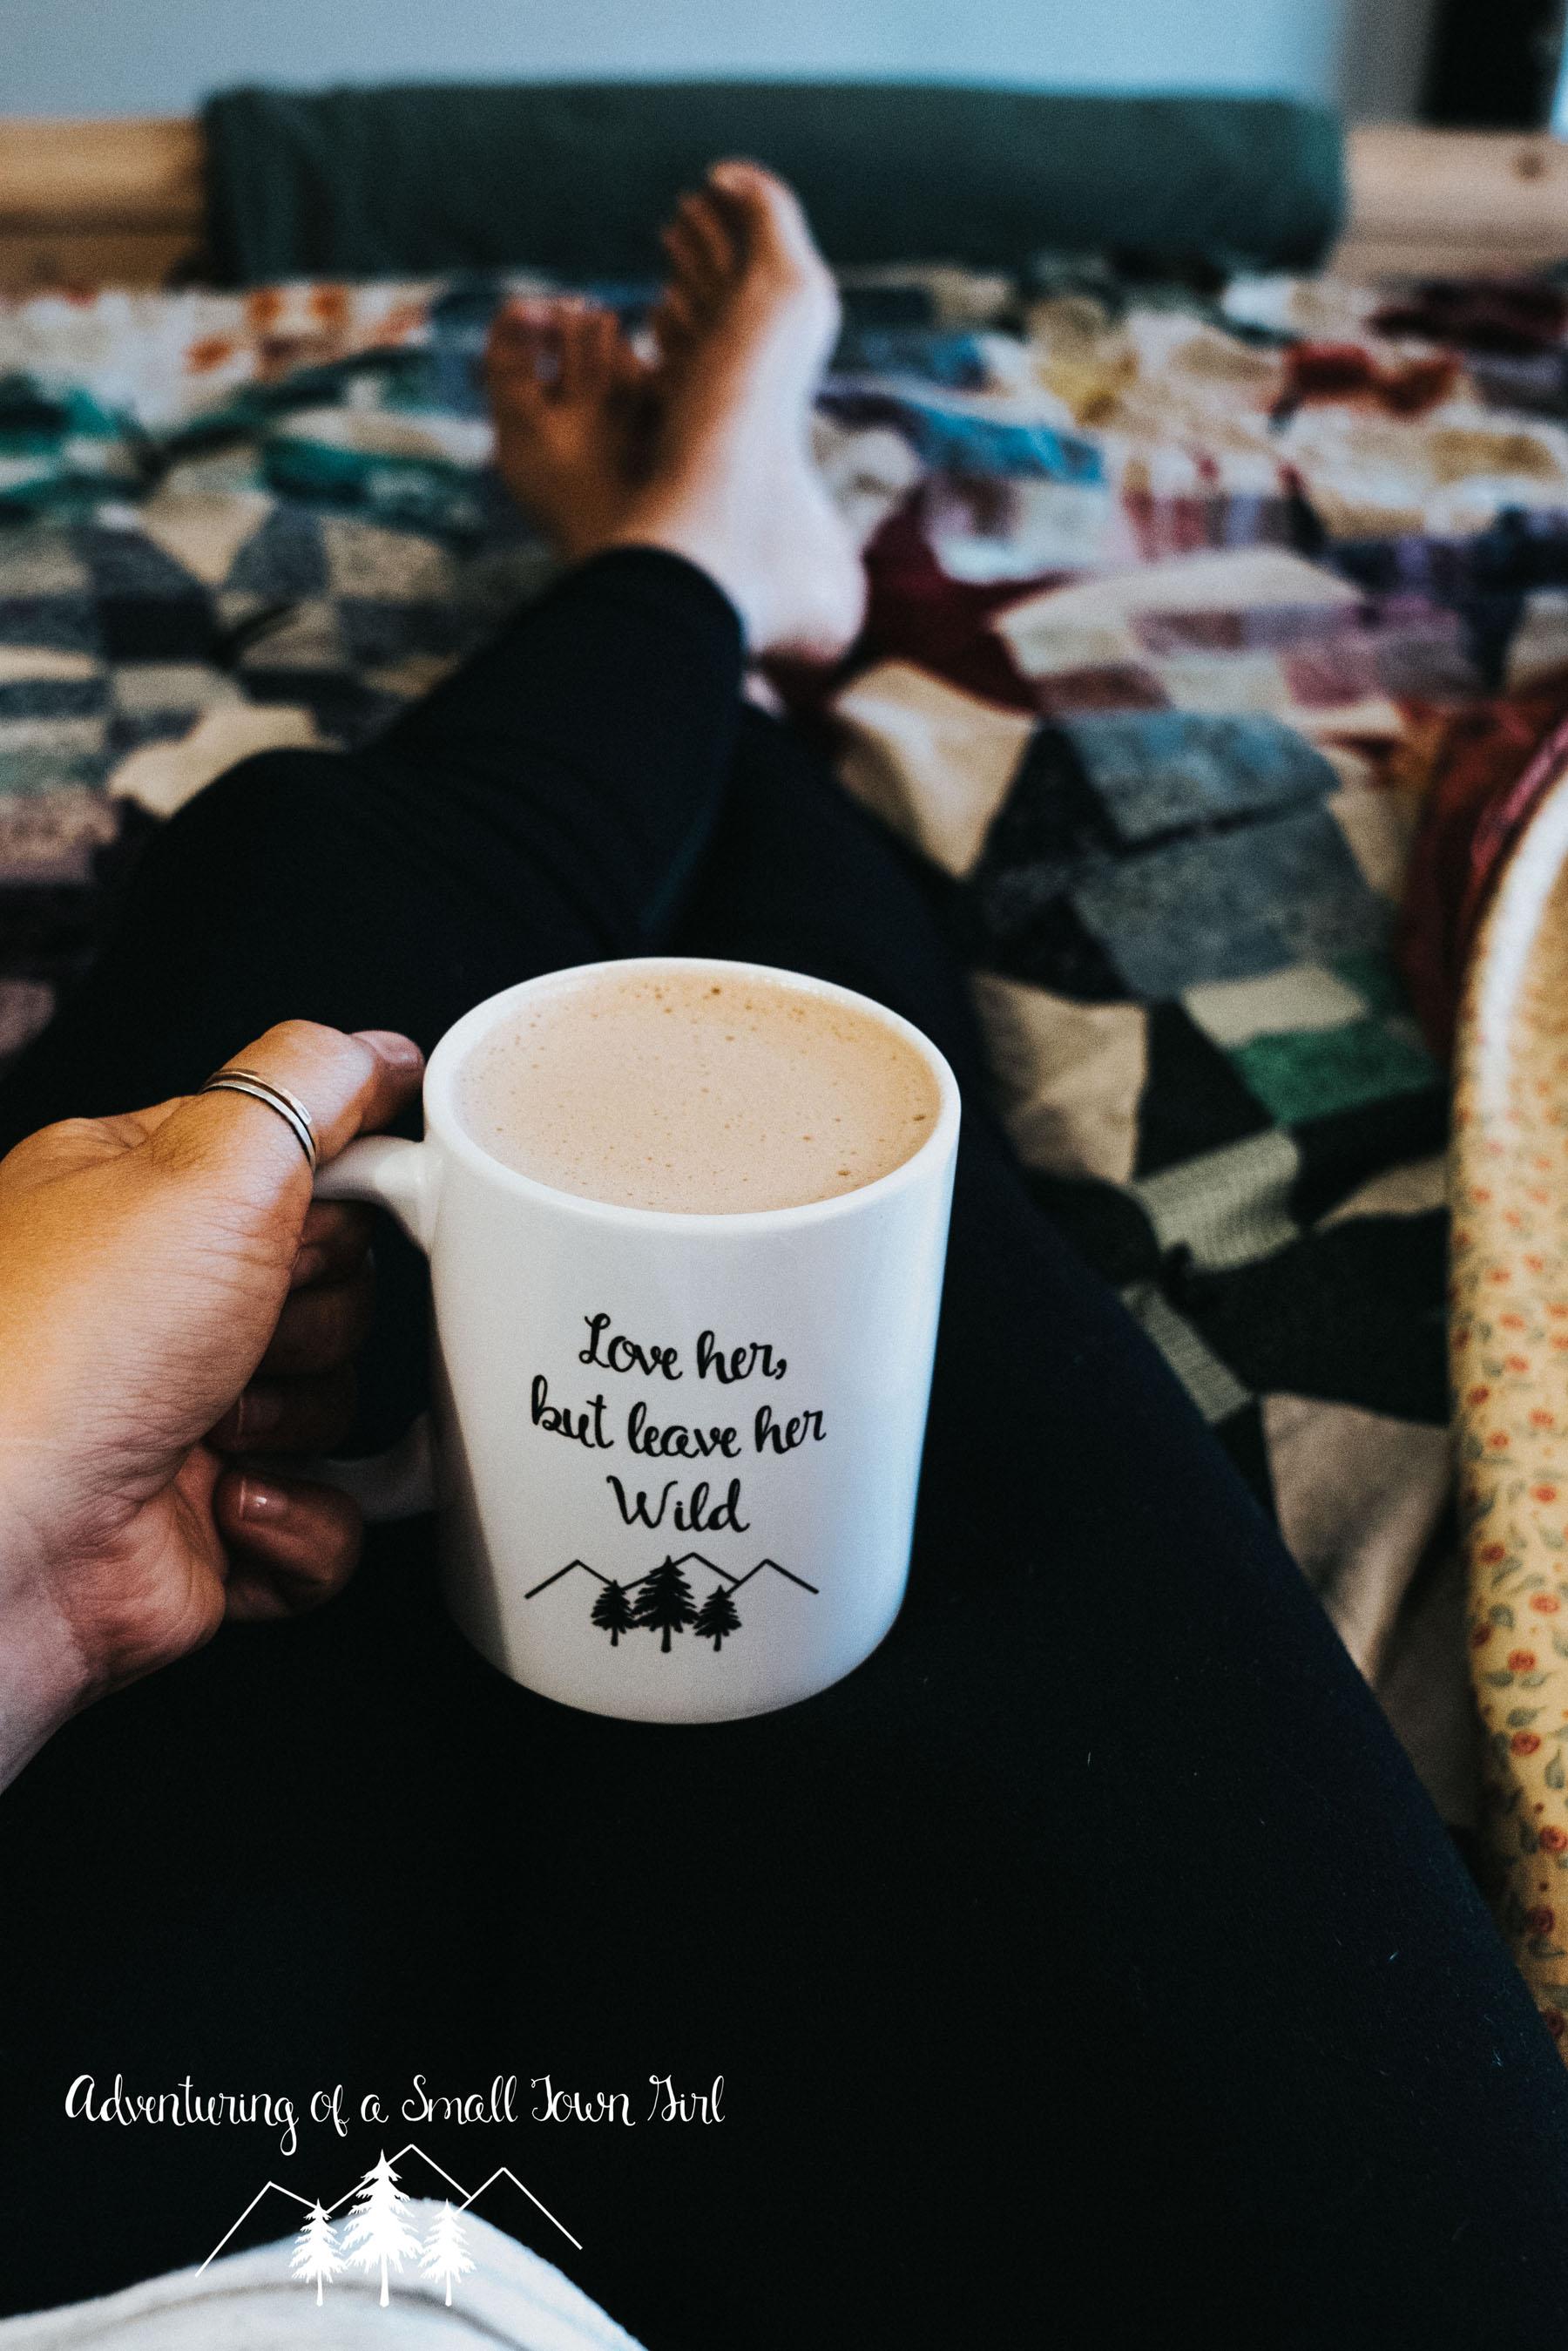 Healthy Latte Recipe - Starbucks Hack - Adventuring of a Small Town Girl-17.jpg